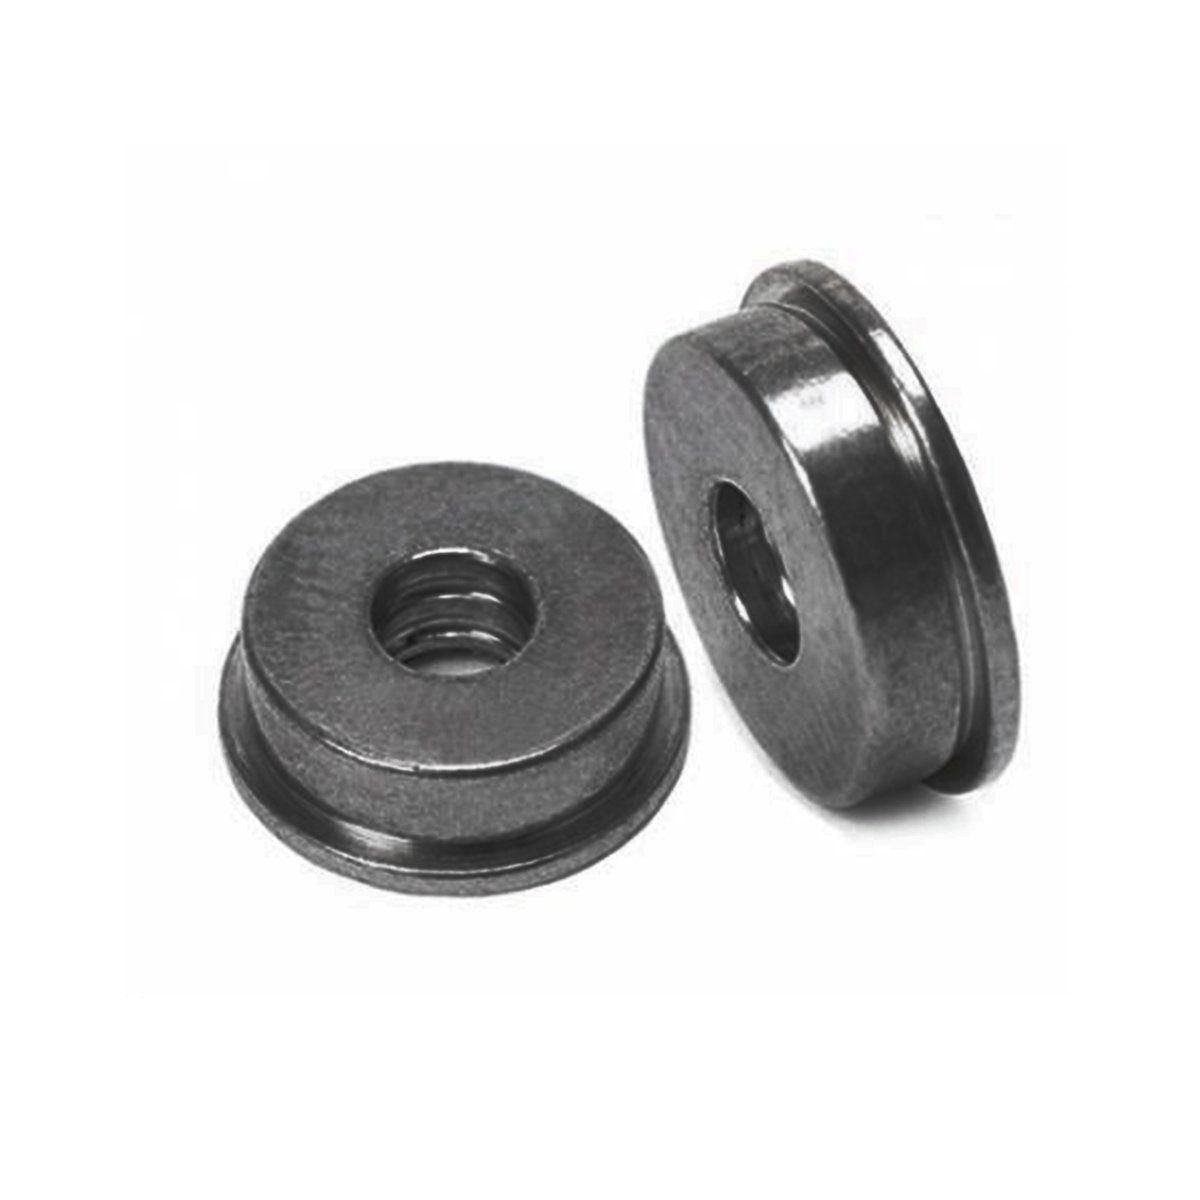 Macal (Bushing) em Aço Inox 7mm Taitus